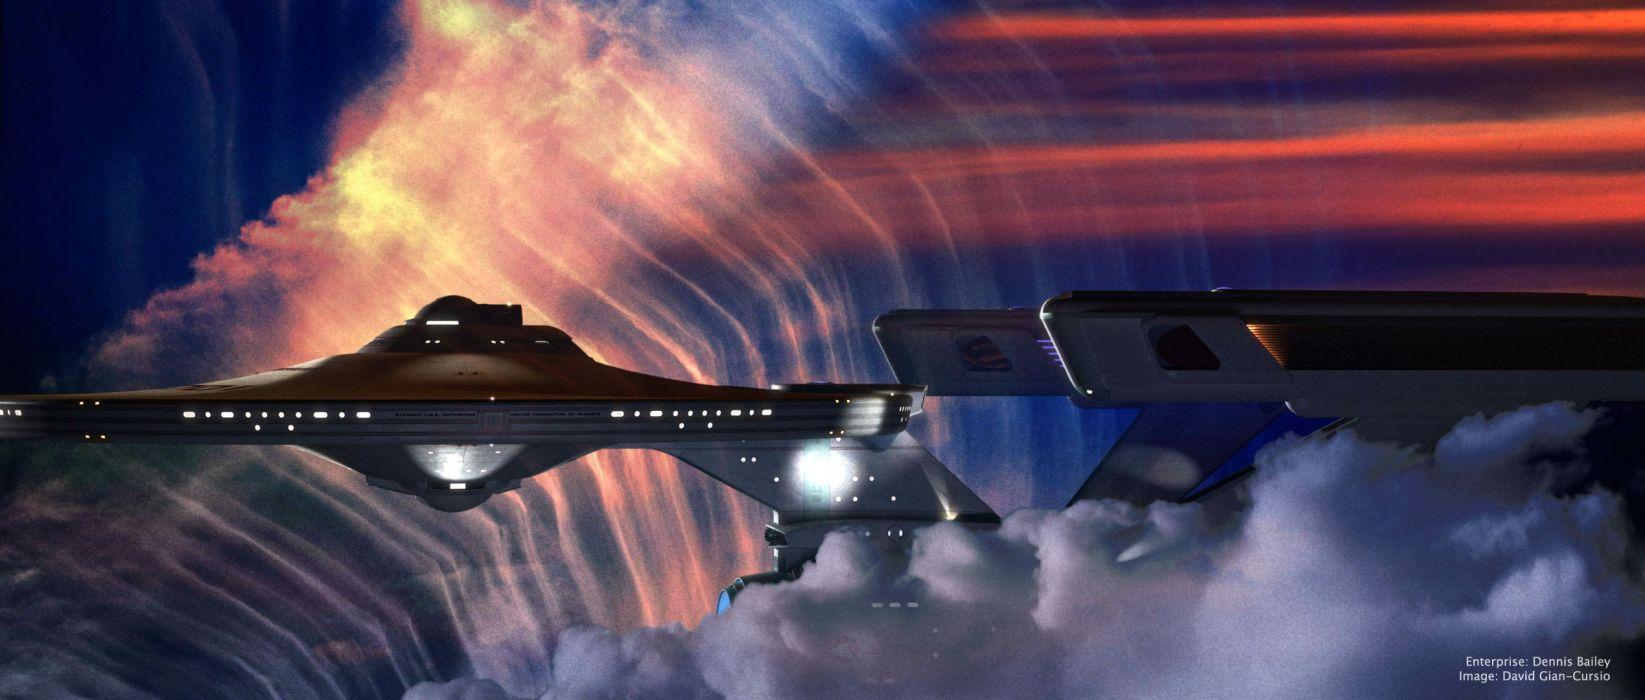 STAR TREK sci-fi action adventure wrath-of-khan wrath khan spaceship     rw wallpaper